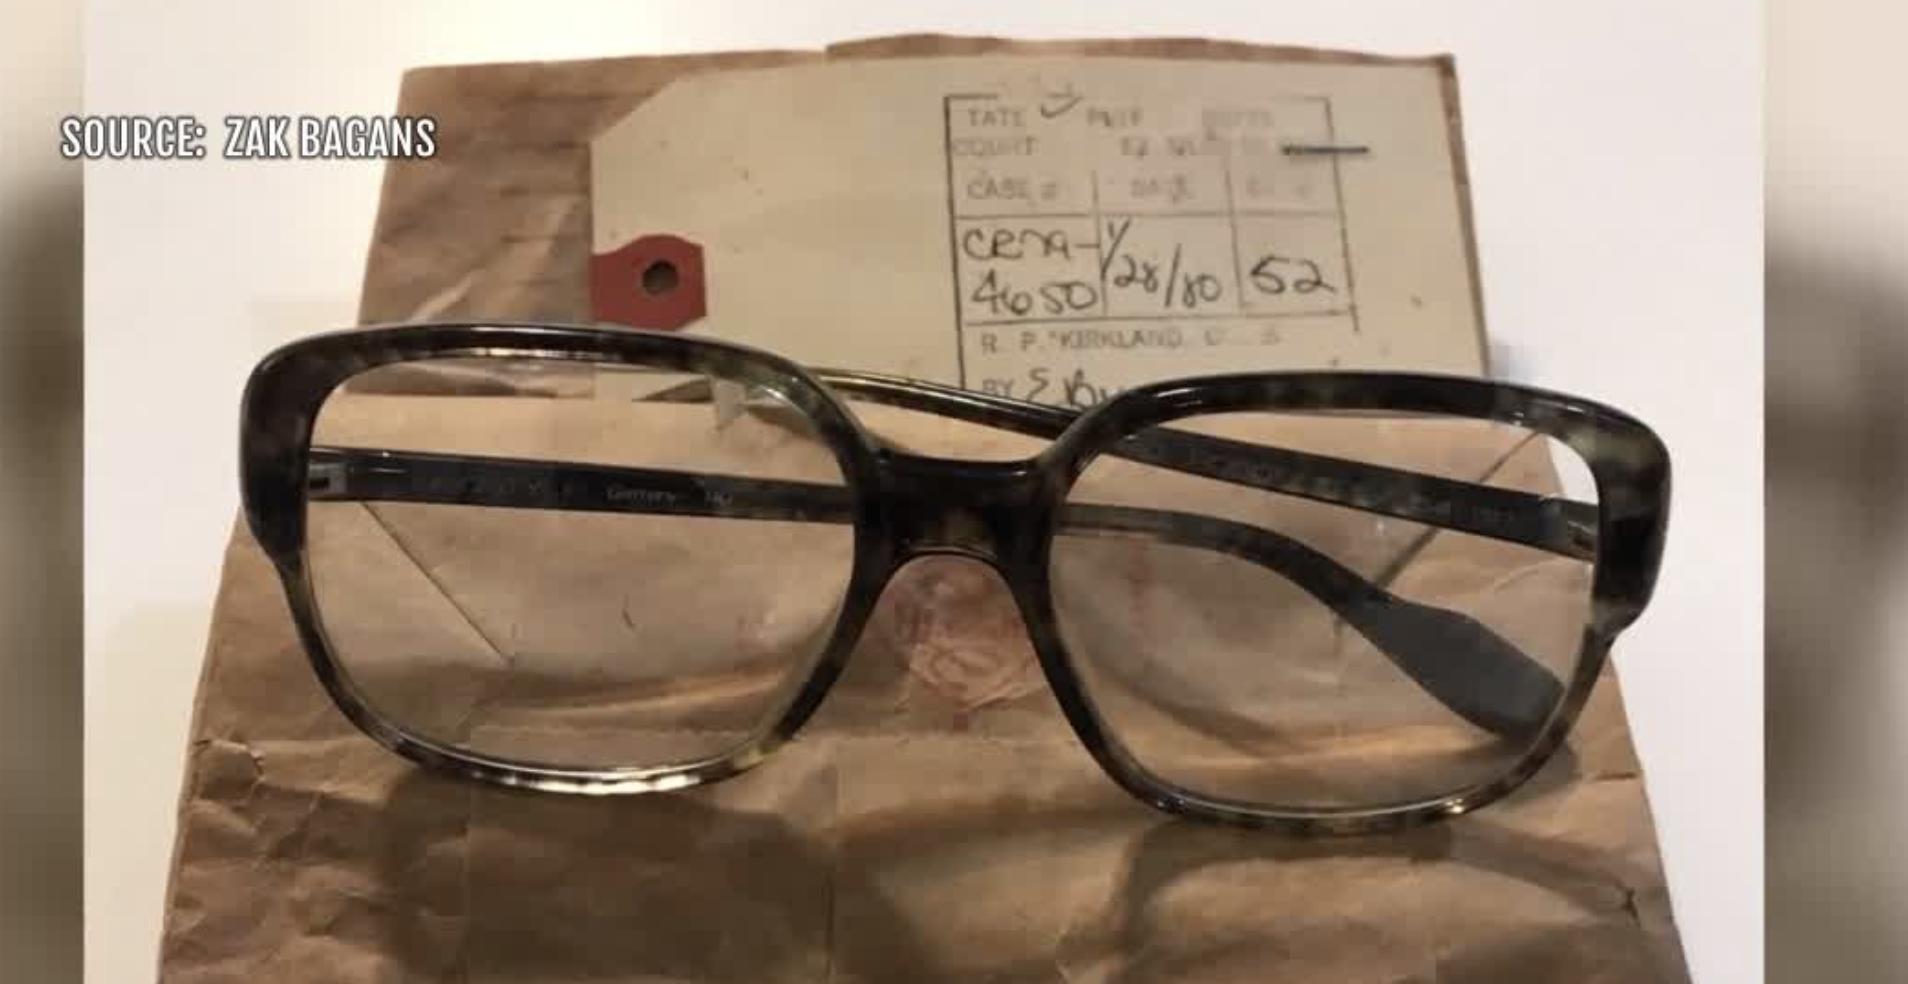 Zak Bagans buys serial killer Ted Bundy's glasses for Las